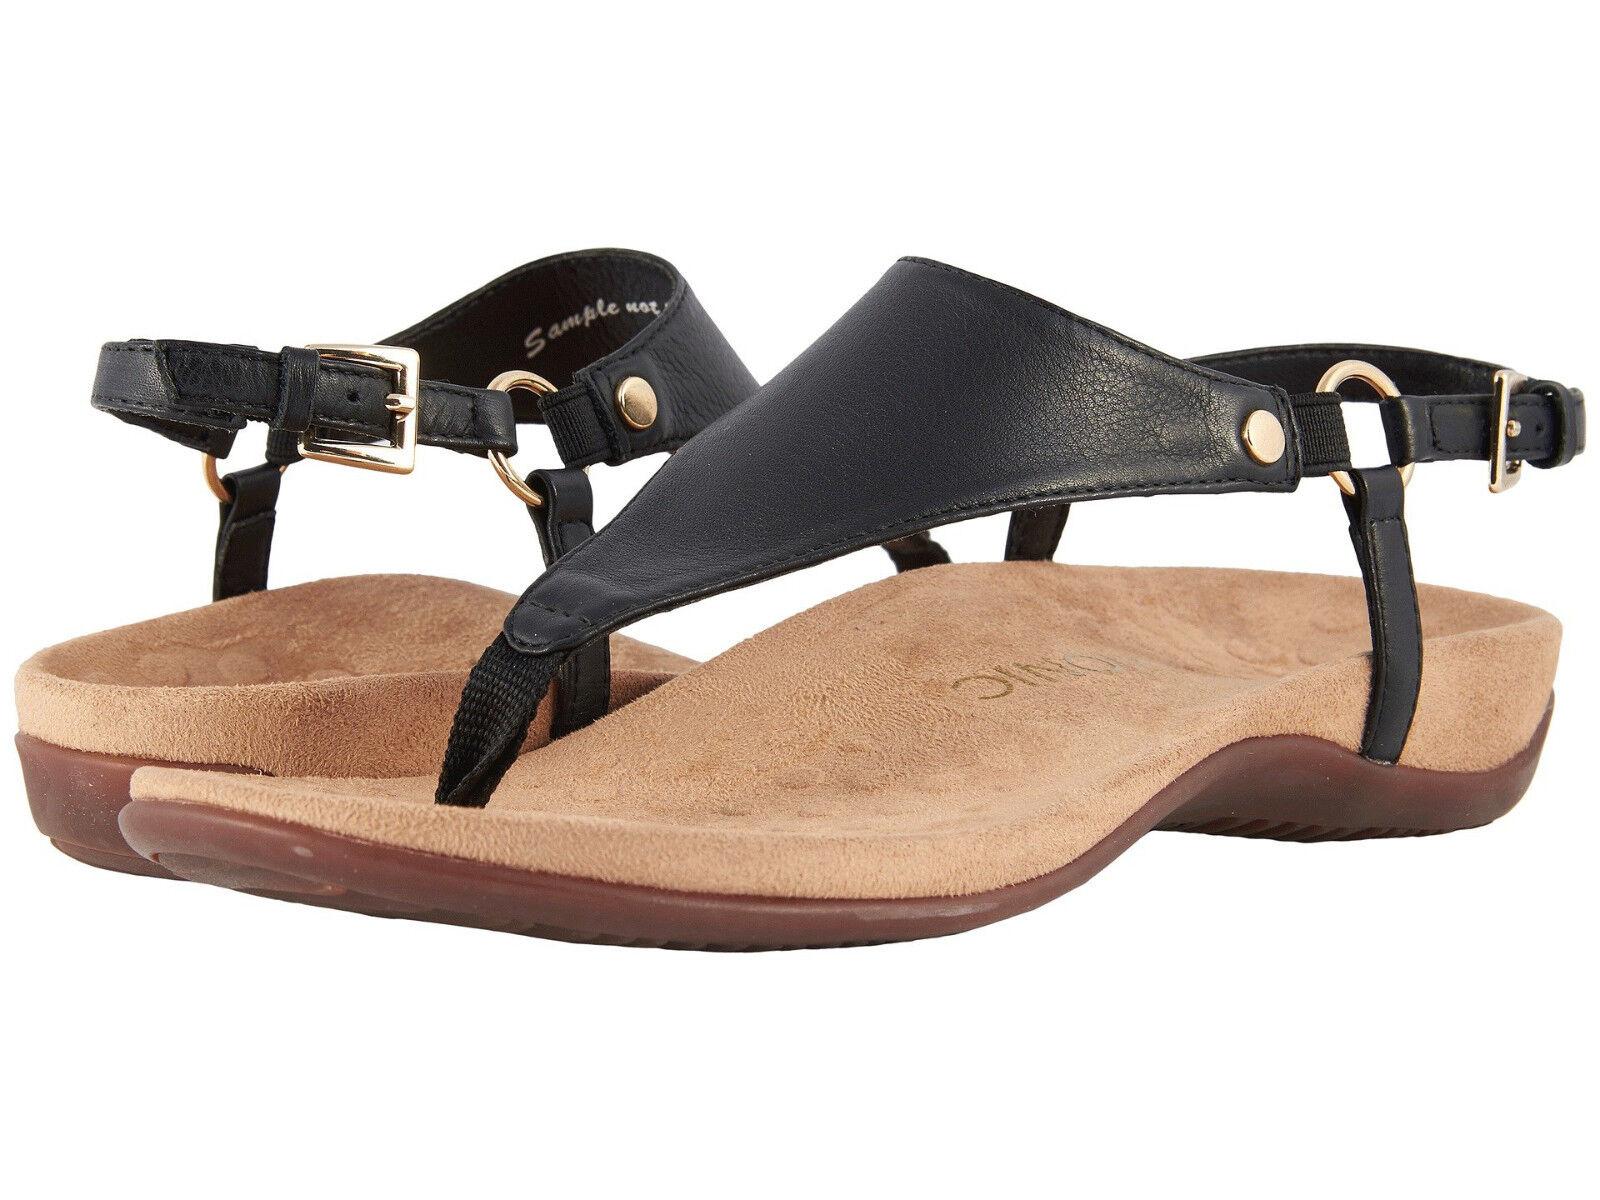 mujer Vionic Orthaheel Kirra Slingback Strap Sandal KIRRA negro 100% Authentic